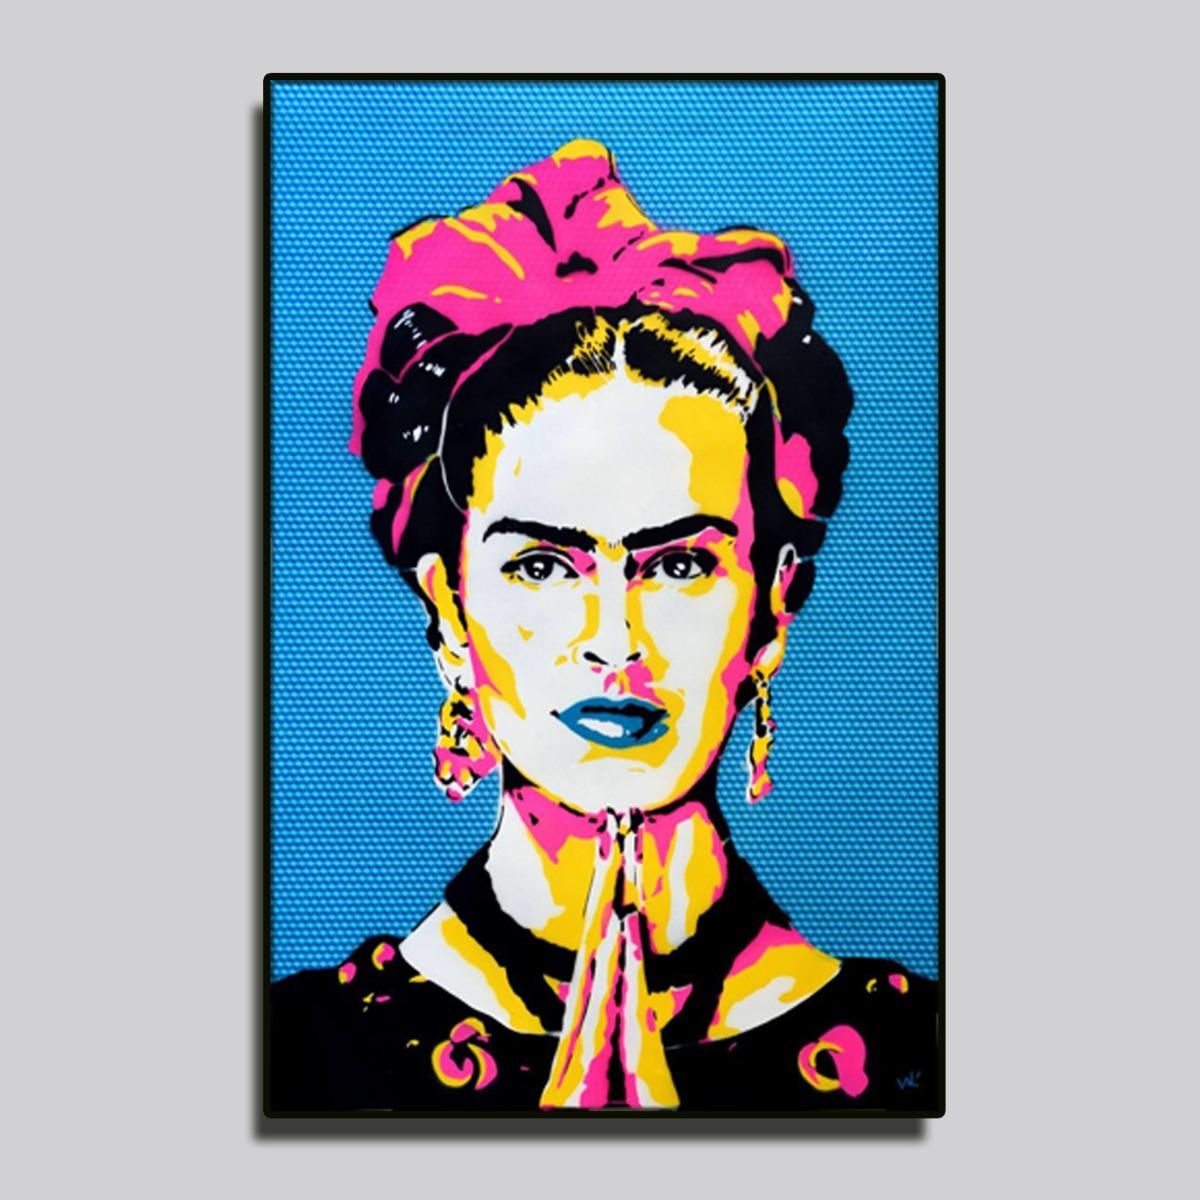 Cuadro moderno decorativo vintage frida kahlo pop art - Cuadros pop art comic ...